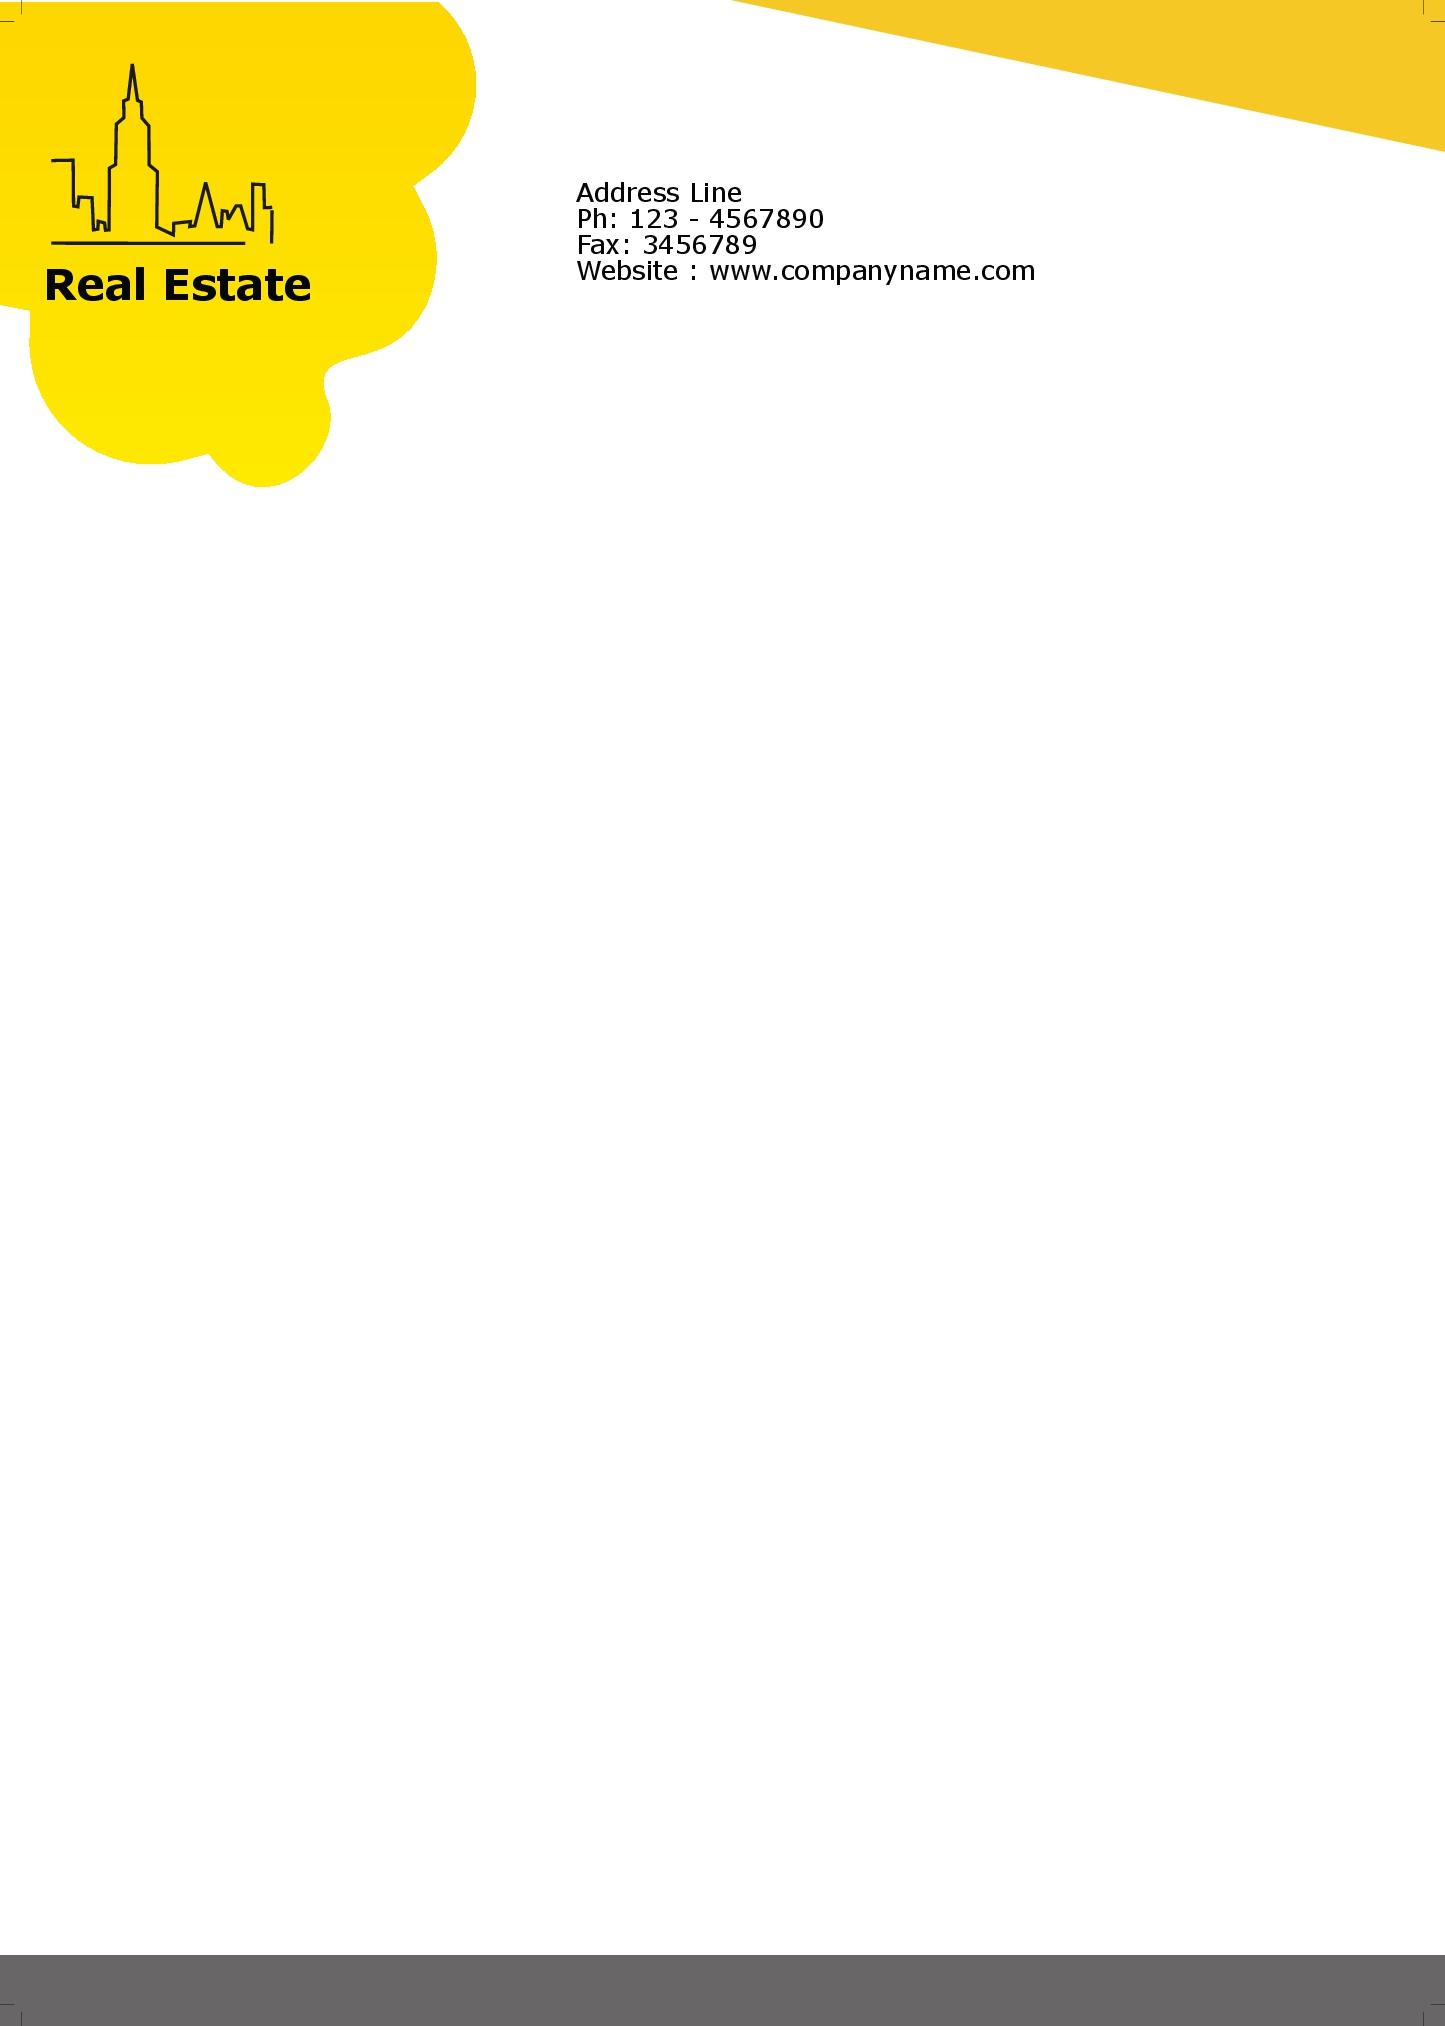 Professional business letterhead printing houston tx free shipping letterhead 87 spiritdancerdesigns Gallery